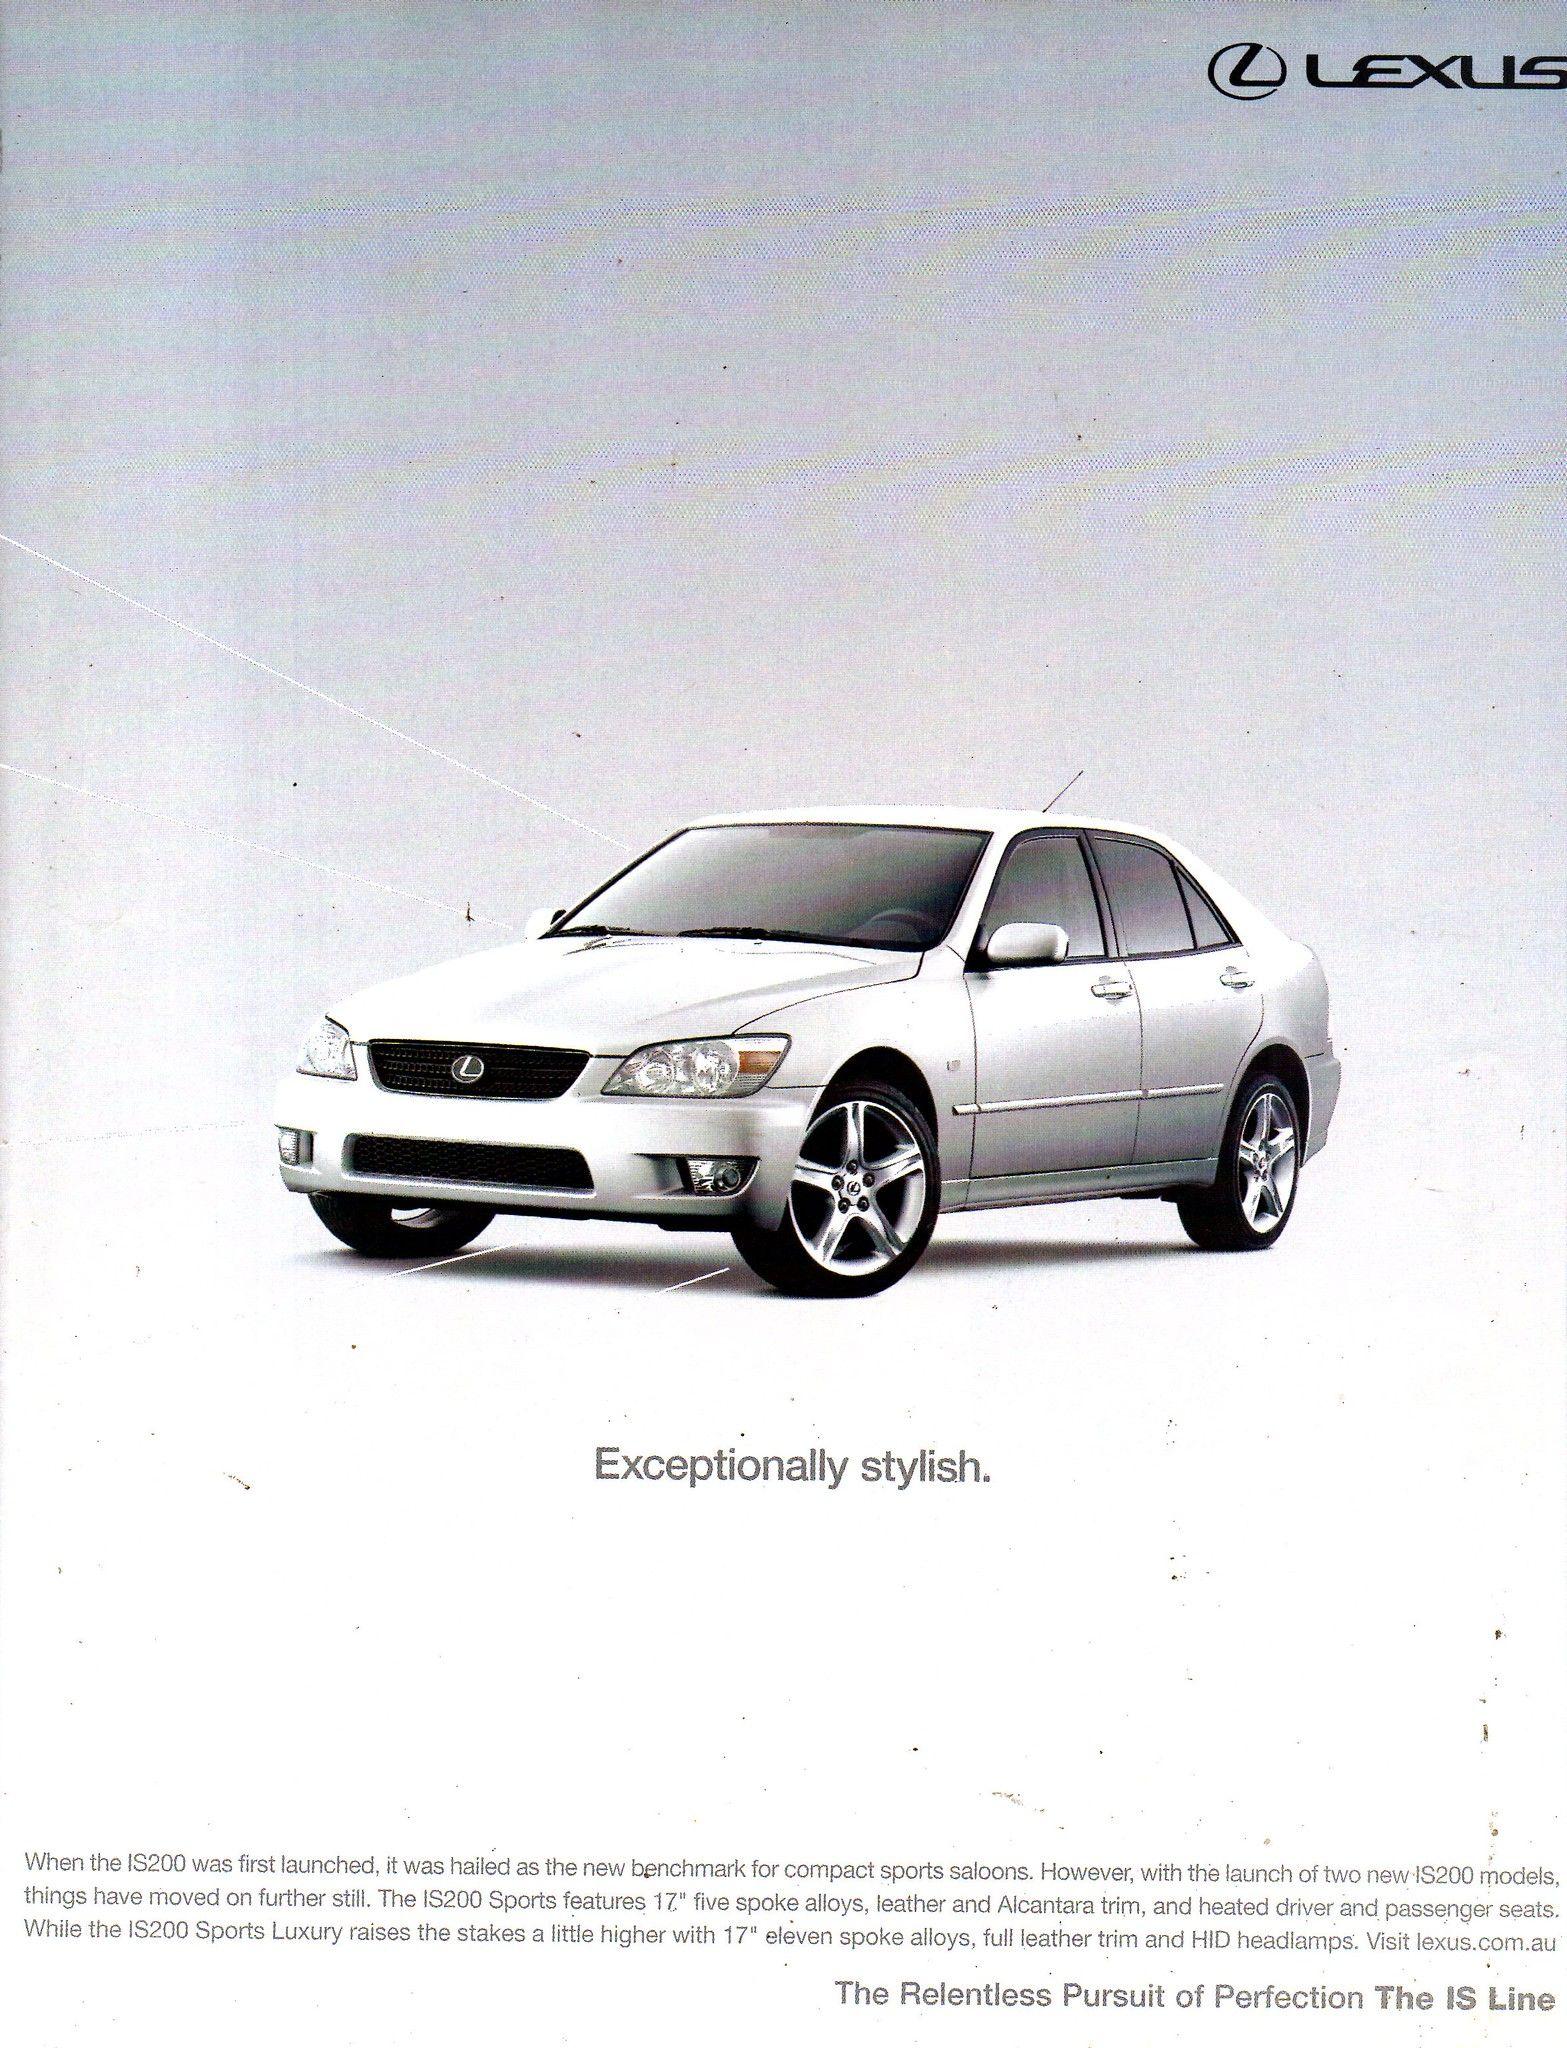 2000s car advertising